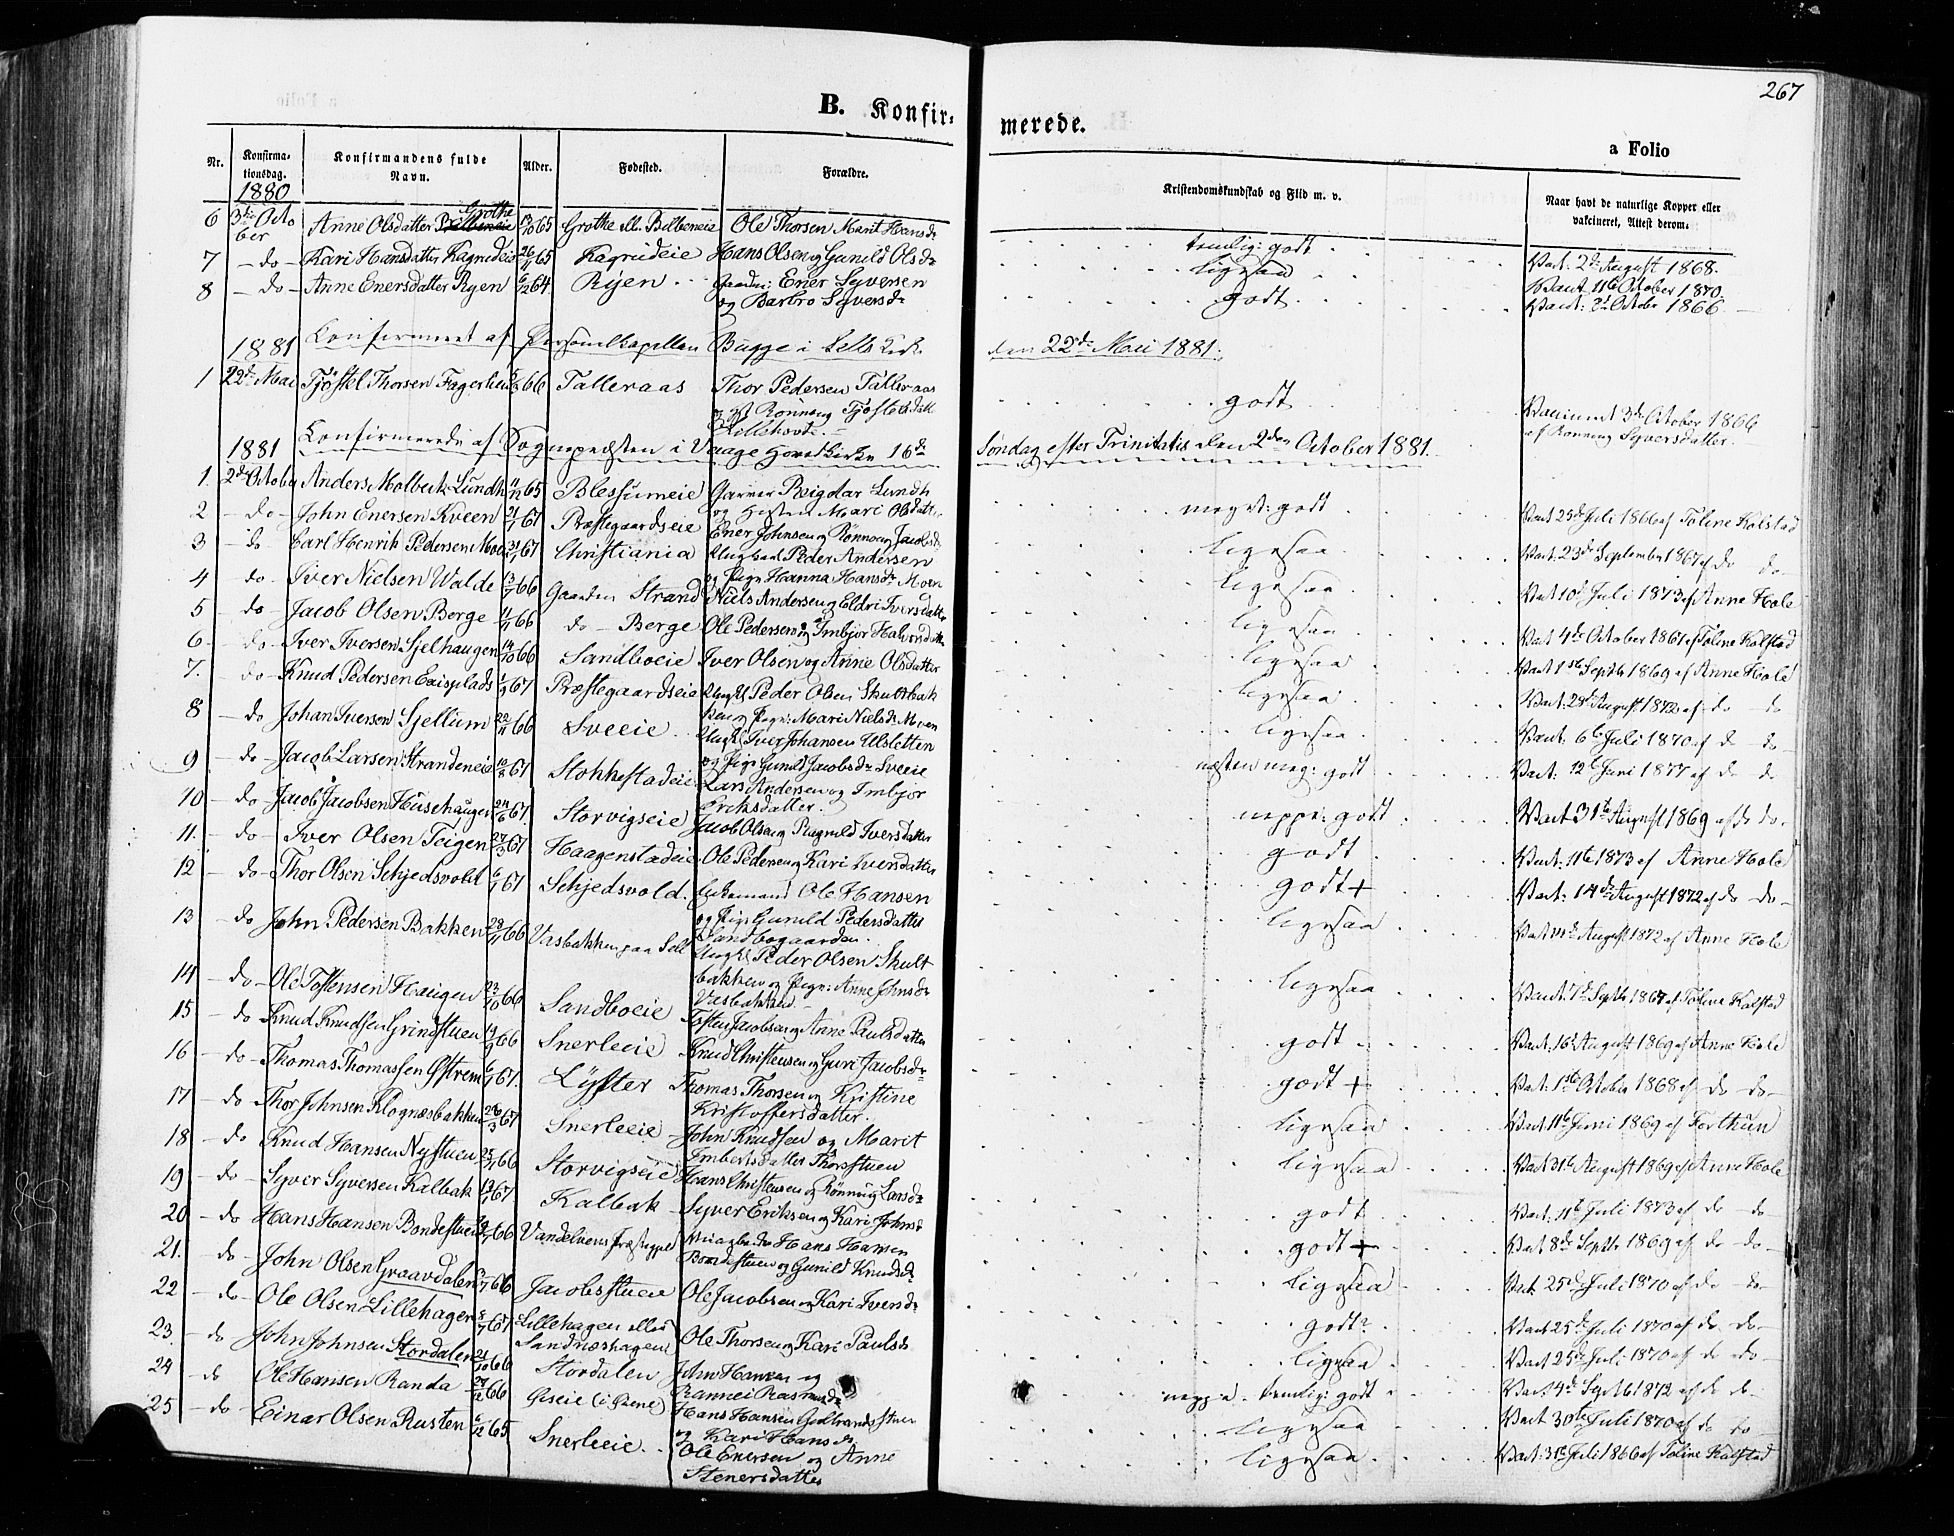 SAH, Vågå prestekontor, Ministerialbok nr. 7 /1, 1872-1886, s. 267